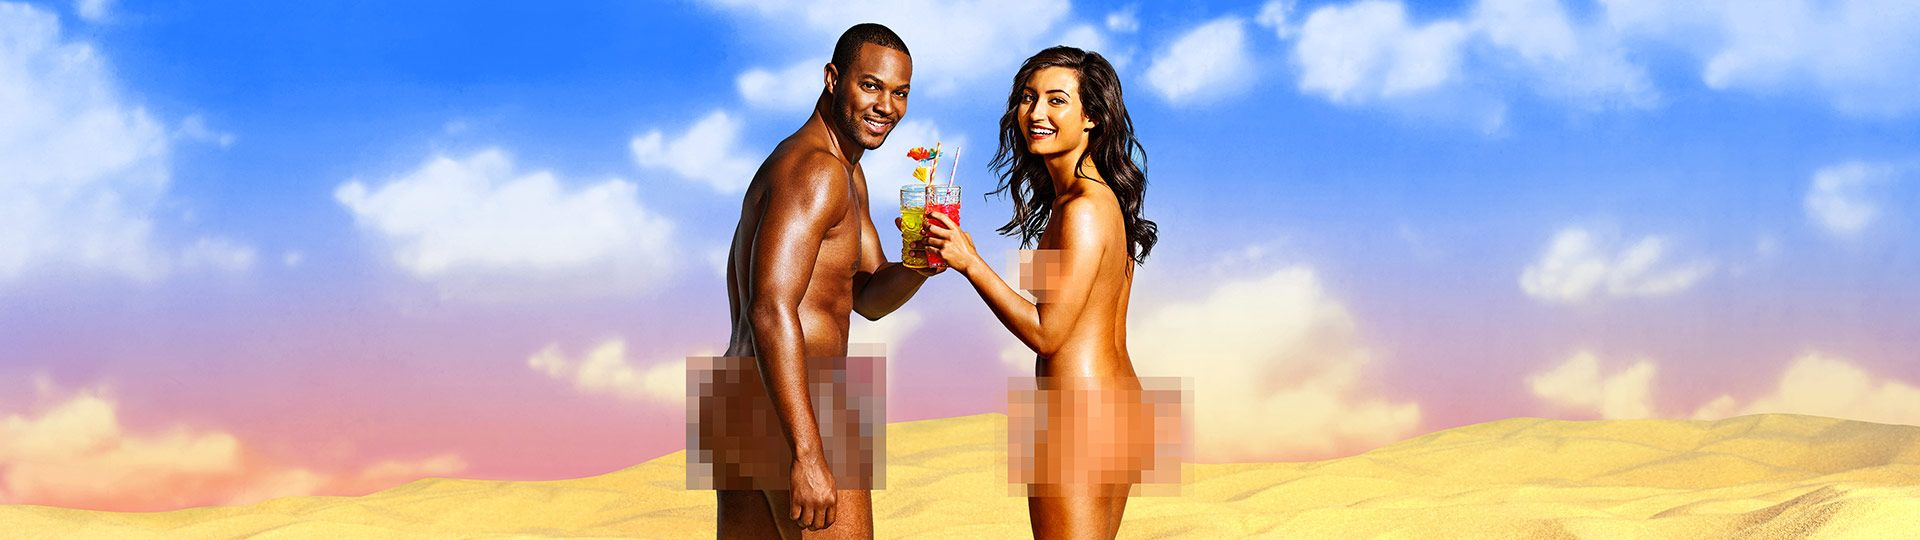 Dating nake tv show uncut